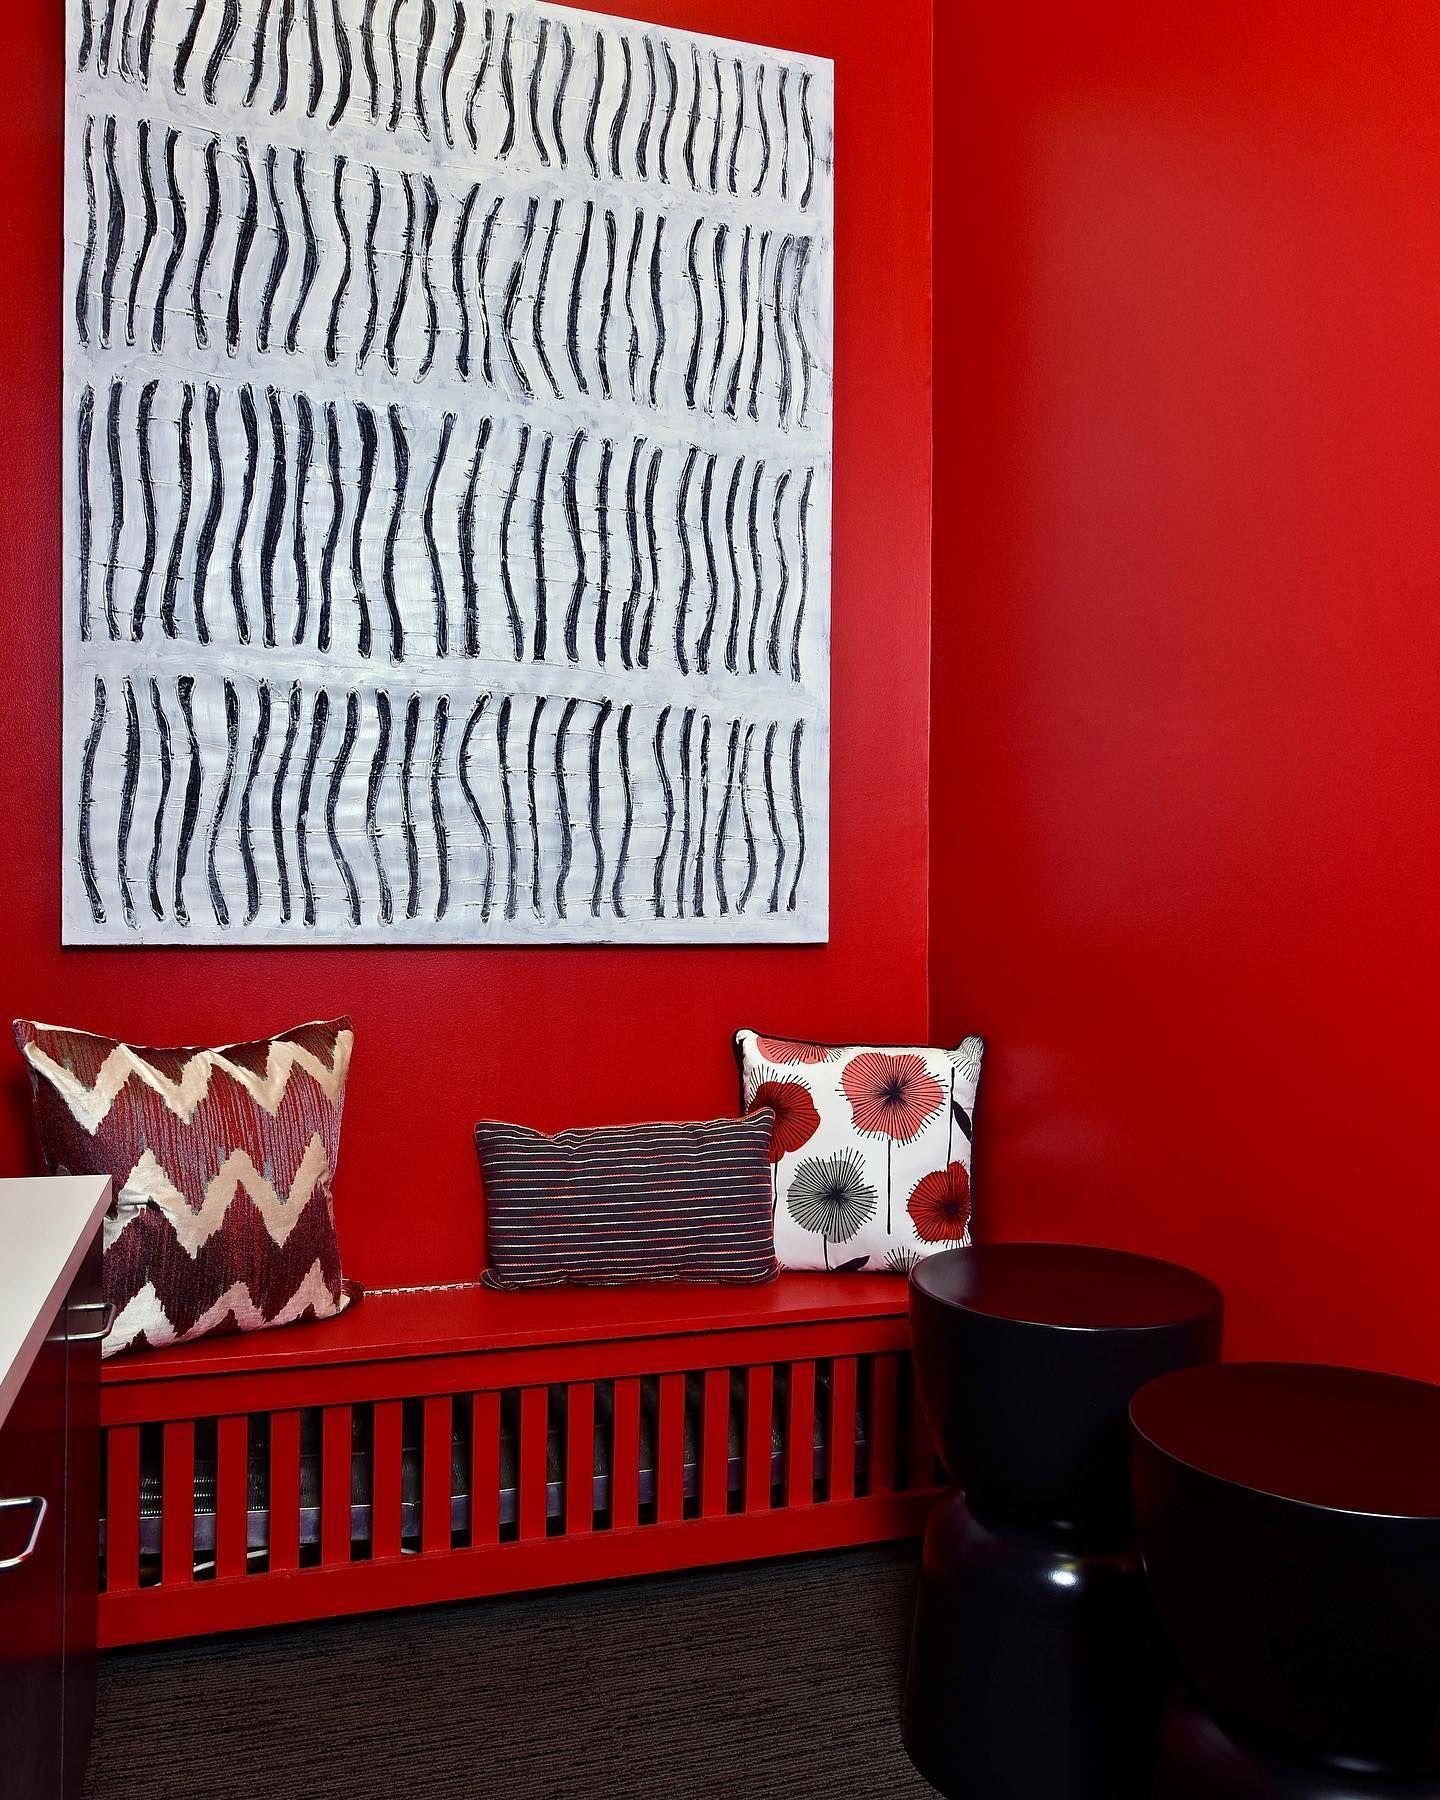 RED HOT.  A vibrant red corner in the break room of our client's Manhattan office. ____________________  Interior Design: @keitaturnerdesign  Photo credit: @edgarscottfoto Location: @lburchettagency @statefarm ____________________  #KeitaTurnerDesign #interiordesigner #nycinteriordesigner #nyinteriordesigner #commercialdesign #contractdesign #officedesign #retaildesign #interiors #interiordesign #redgreywhite #statefarm #brands #breakroom #nycinteriors #nyinteriors #branding #manhattannyc #manha